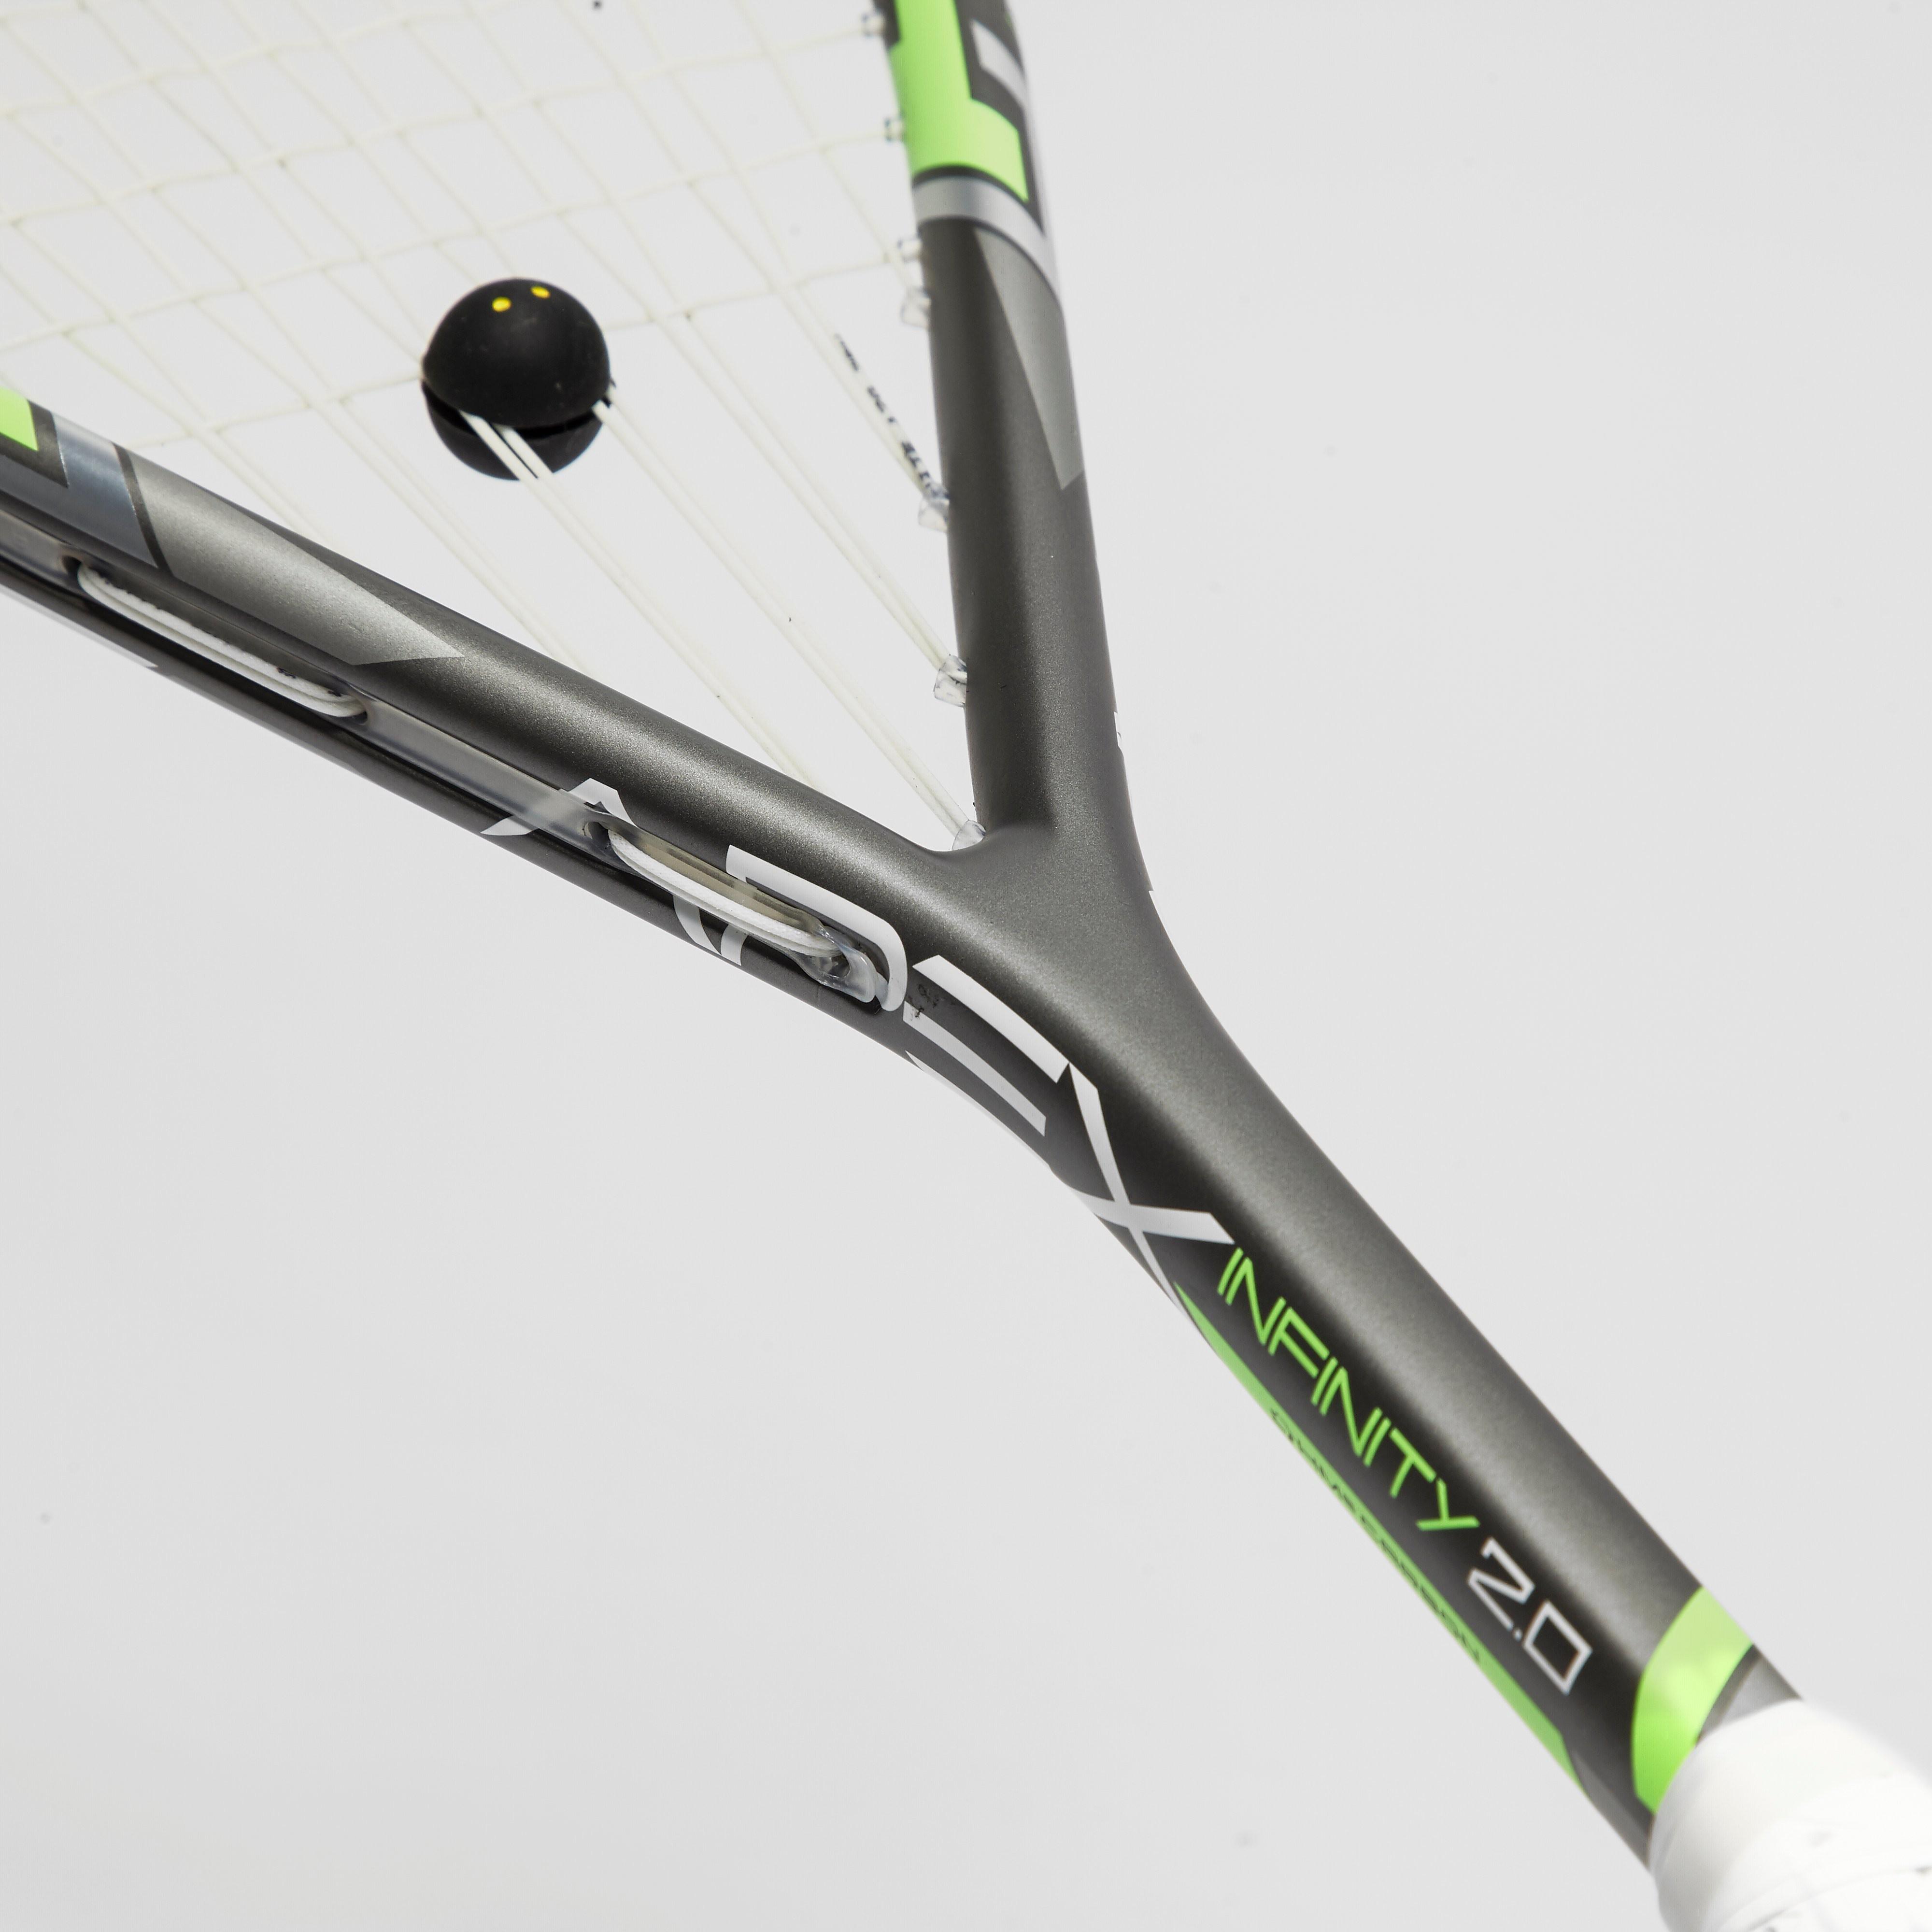 Dunlop APEX INFINITY 2.0 SQUASH RACKET